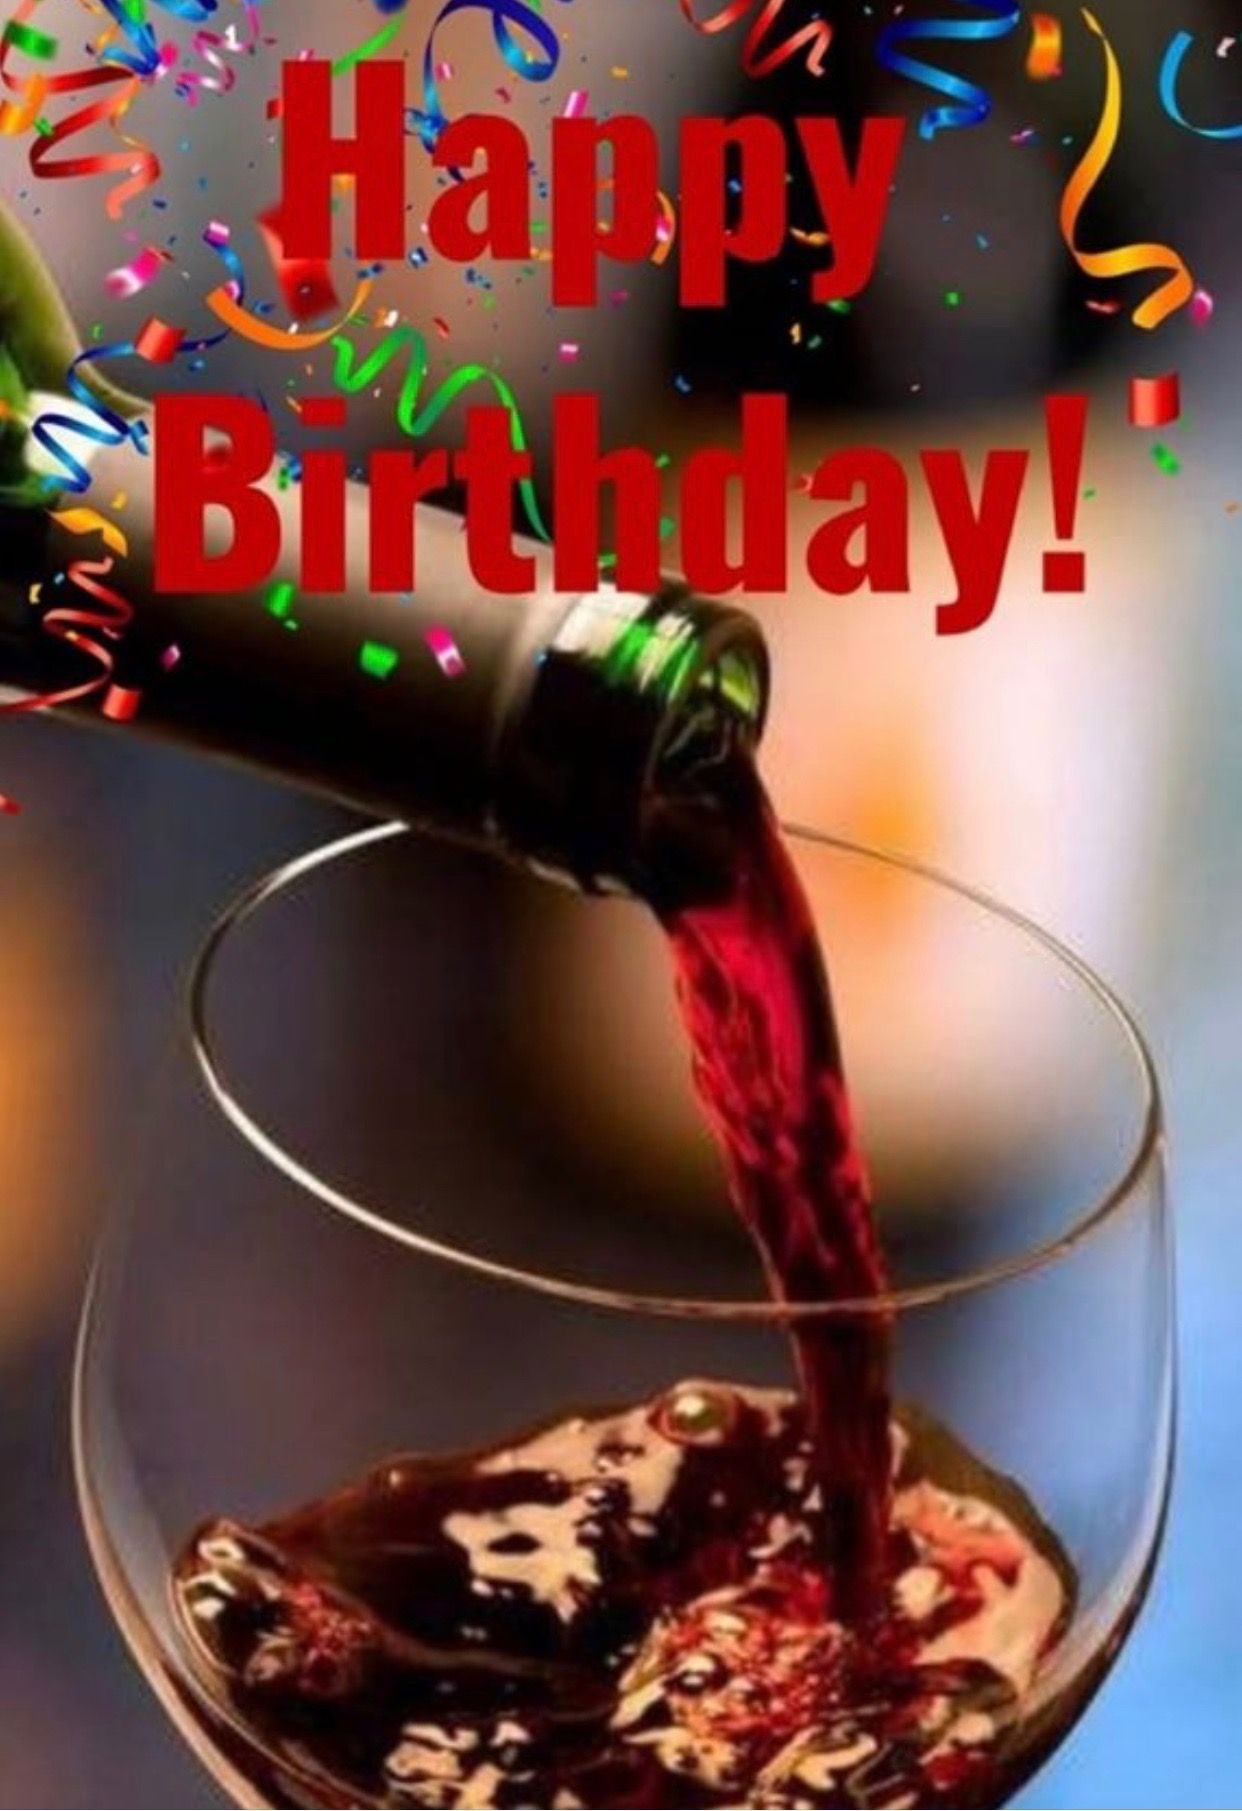 Pin By Tonya Beasley On Cards Happy Birthday Man Happy Birthday